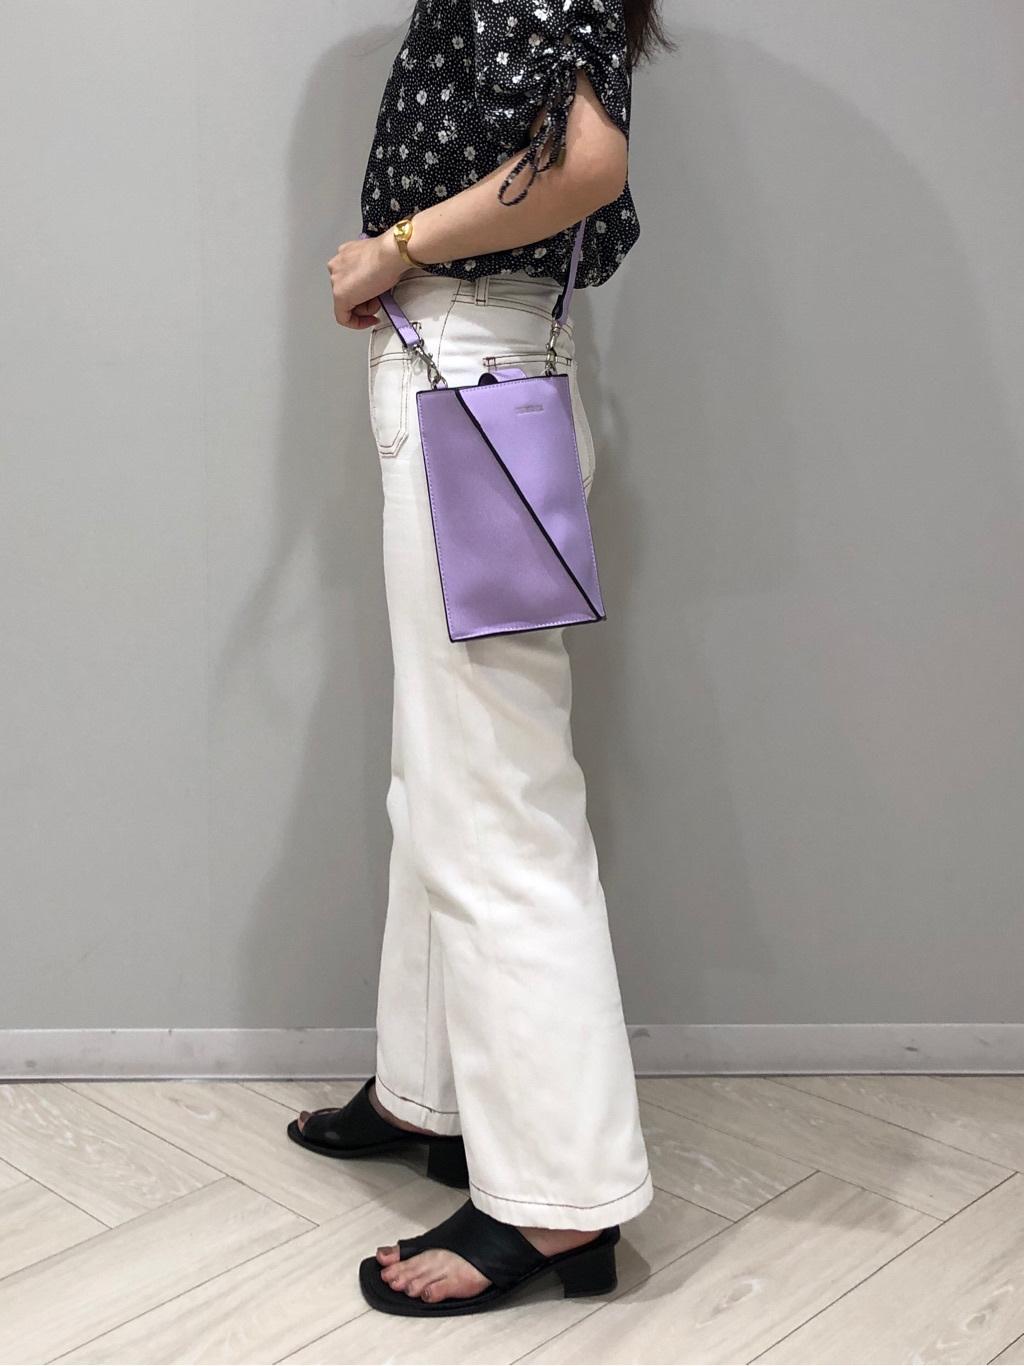 SAMANTHAVEGA ルミネ立川店 Tsuzumi